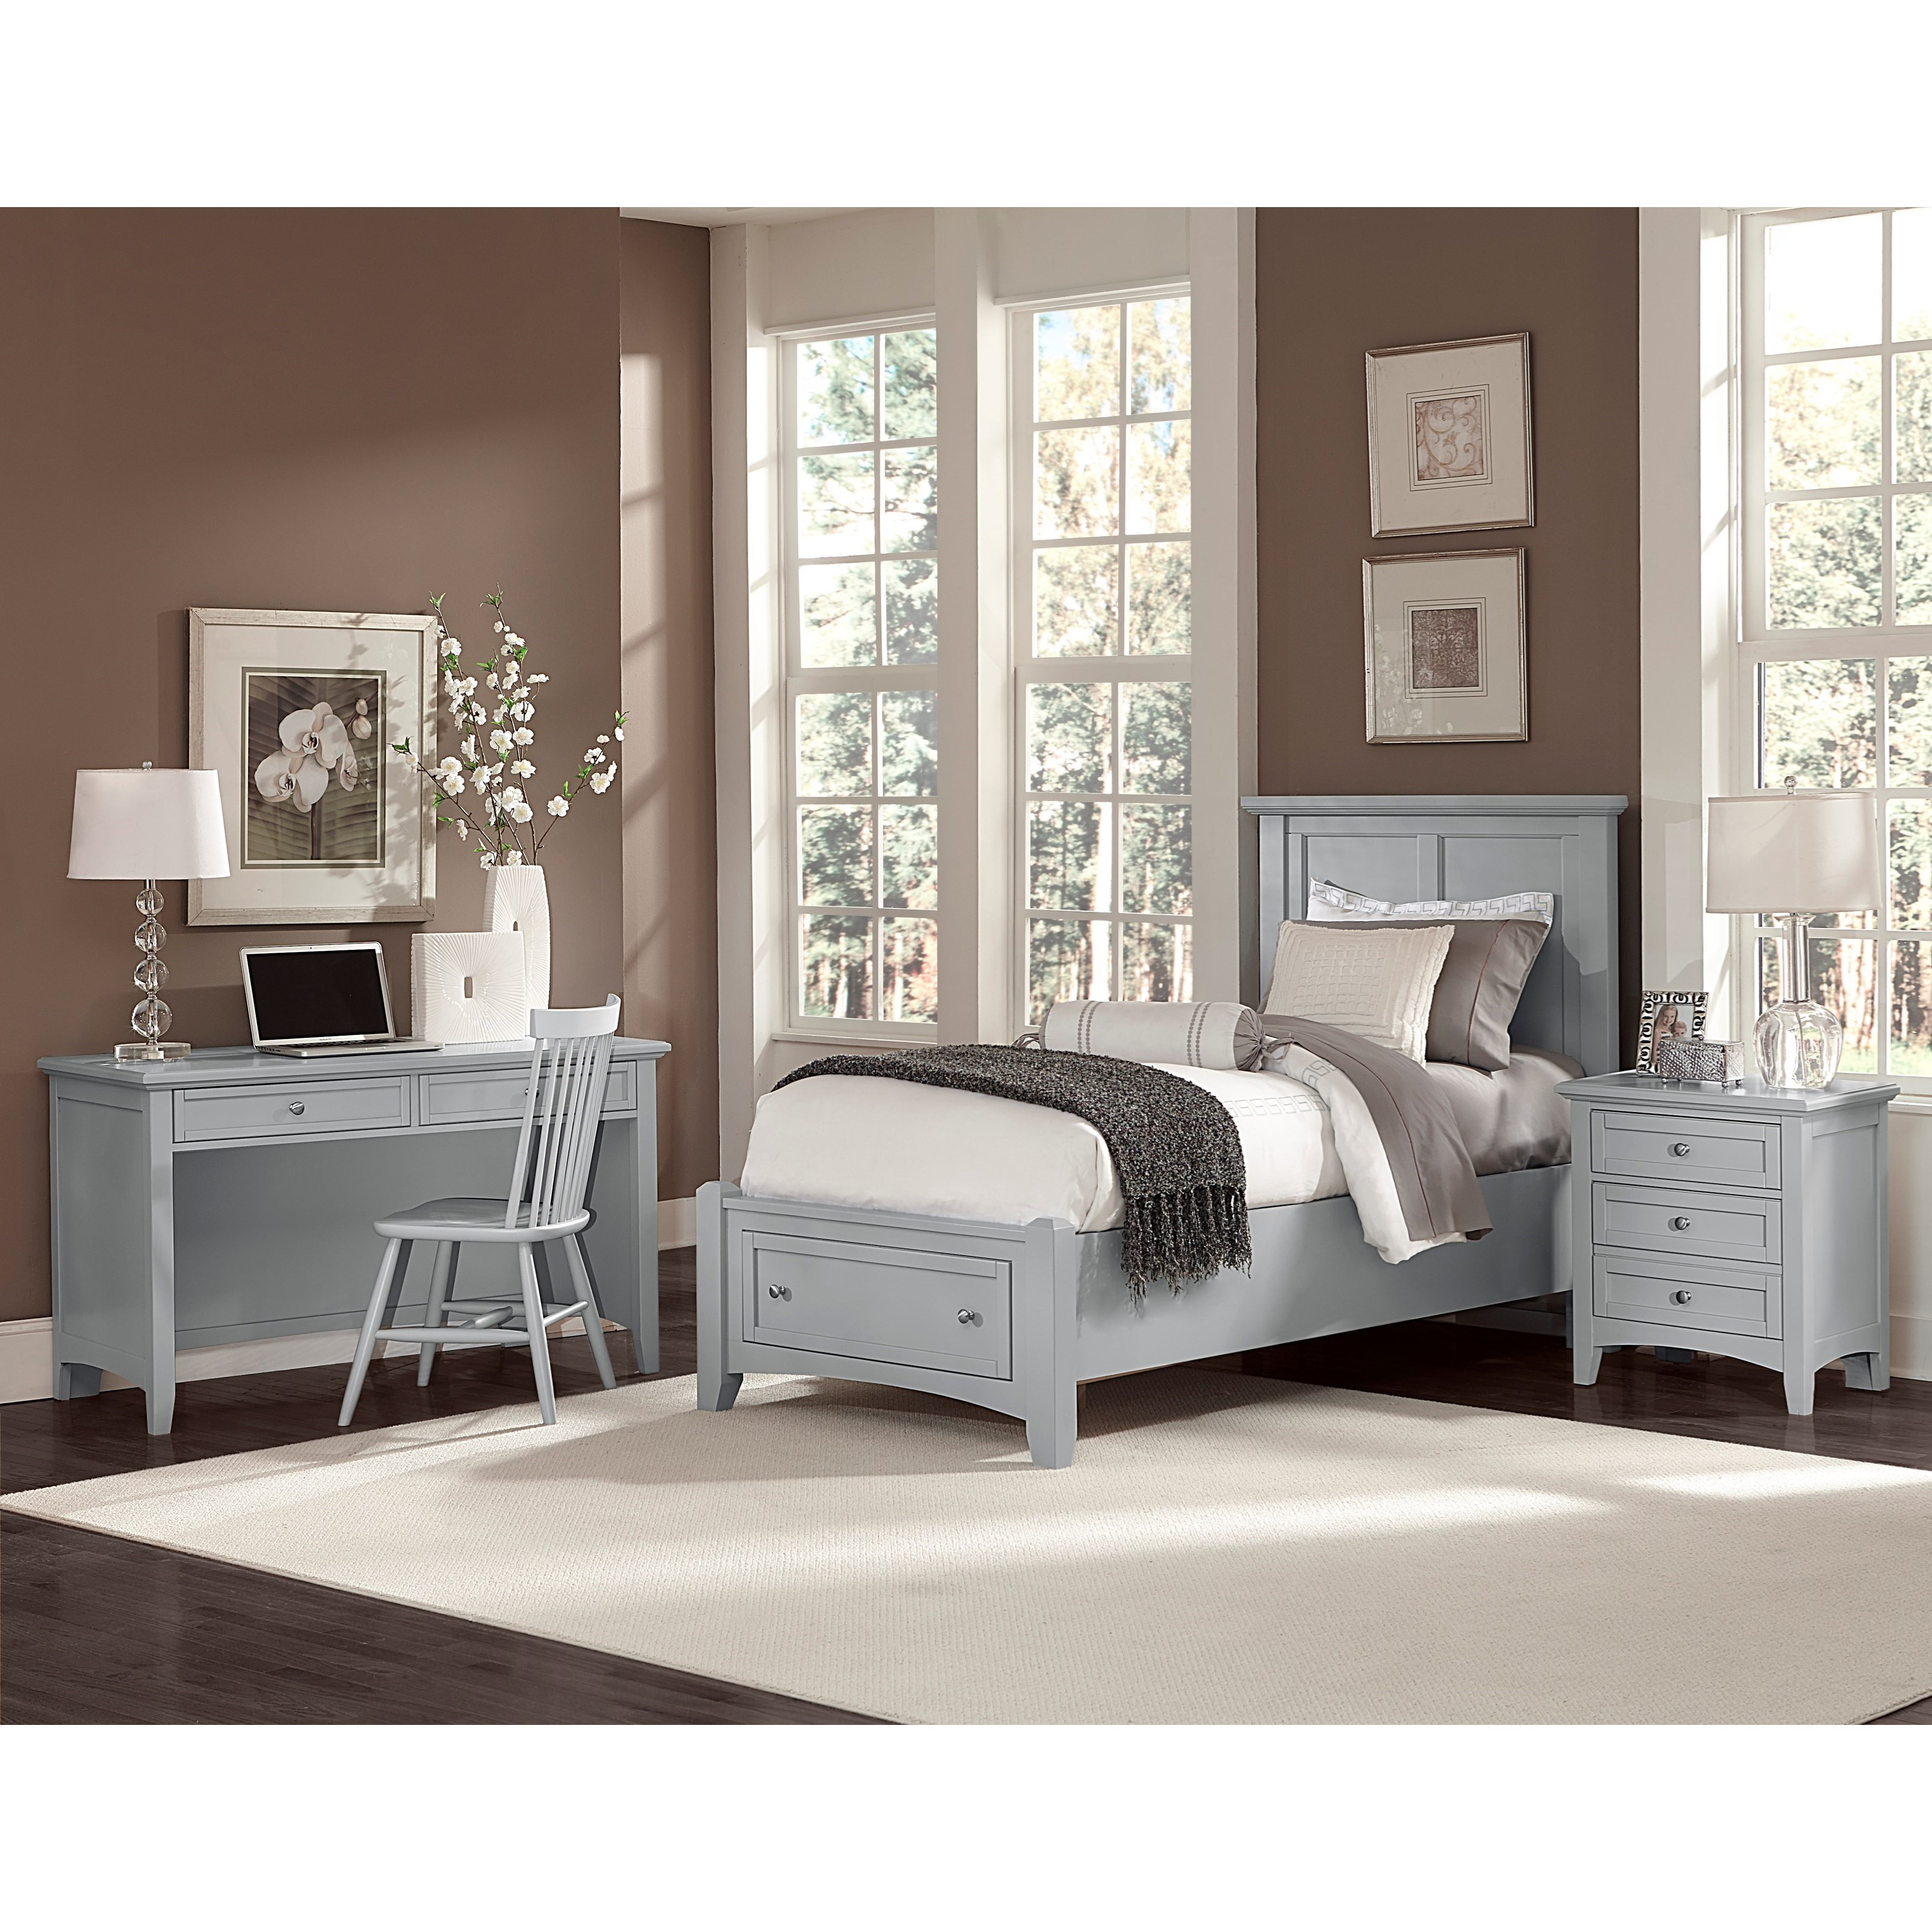 vaughan bassett bonanza twin bedroom group jacksonville furniture mart bedroom groups. Black Bedroom Furniture Sets. Home Design Ideas